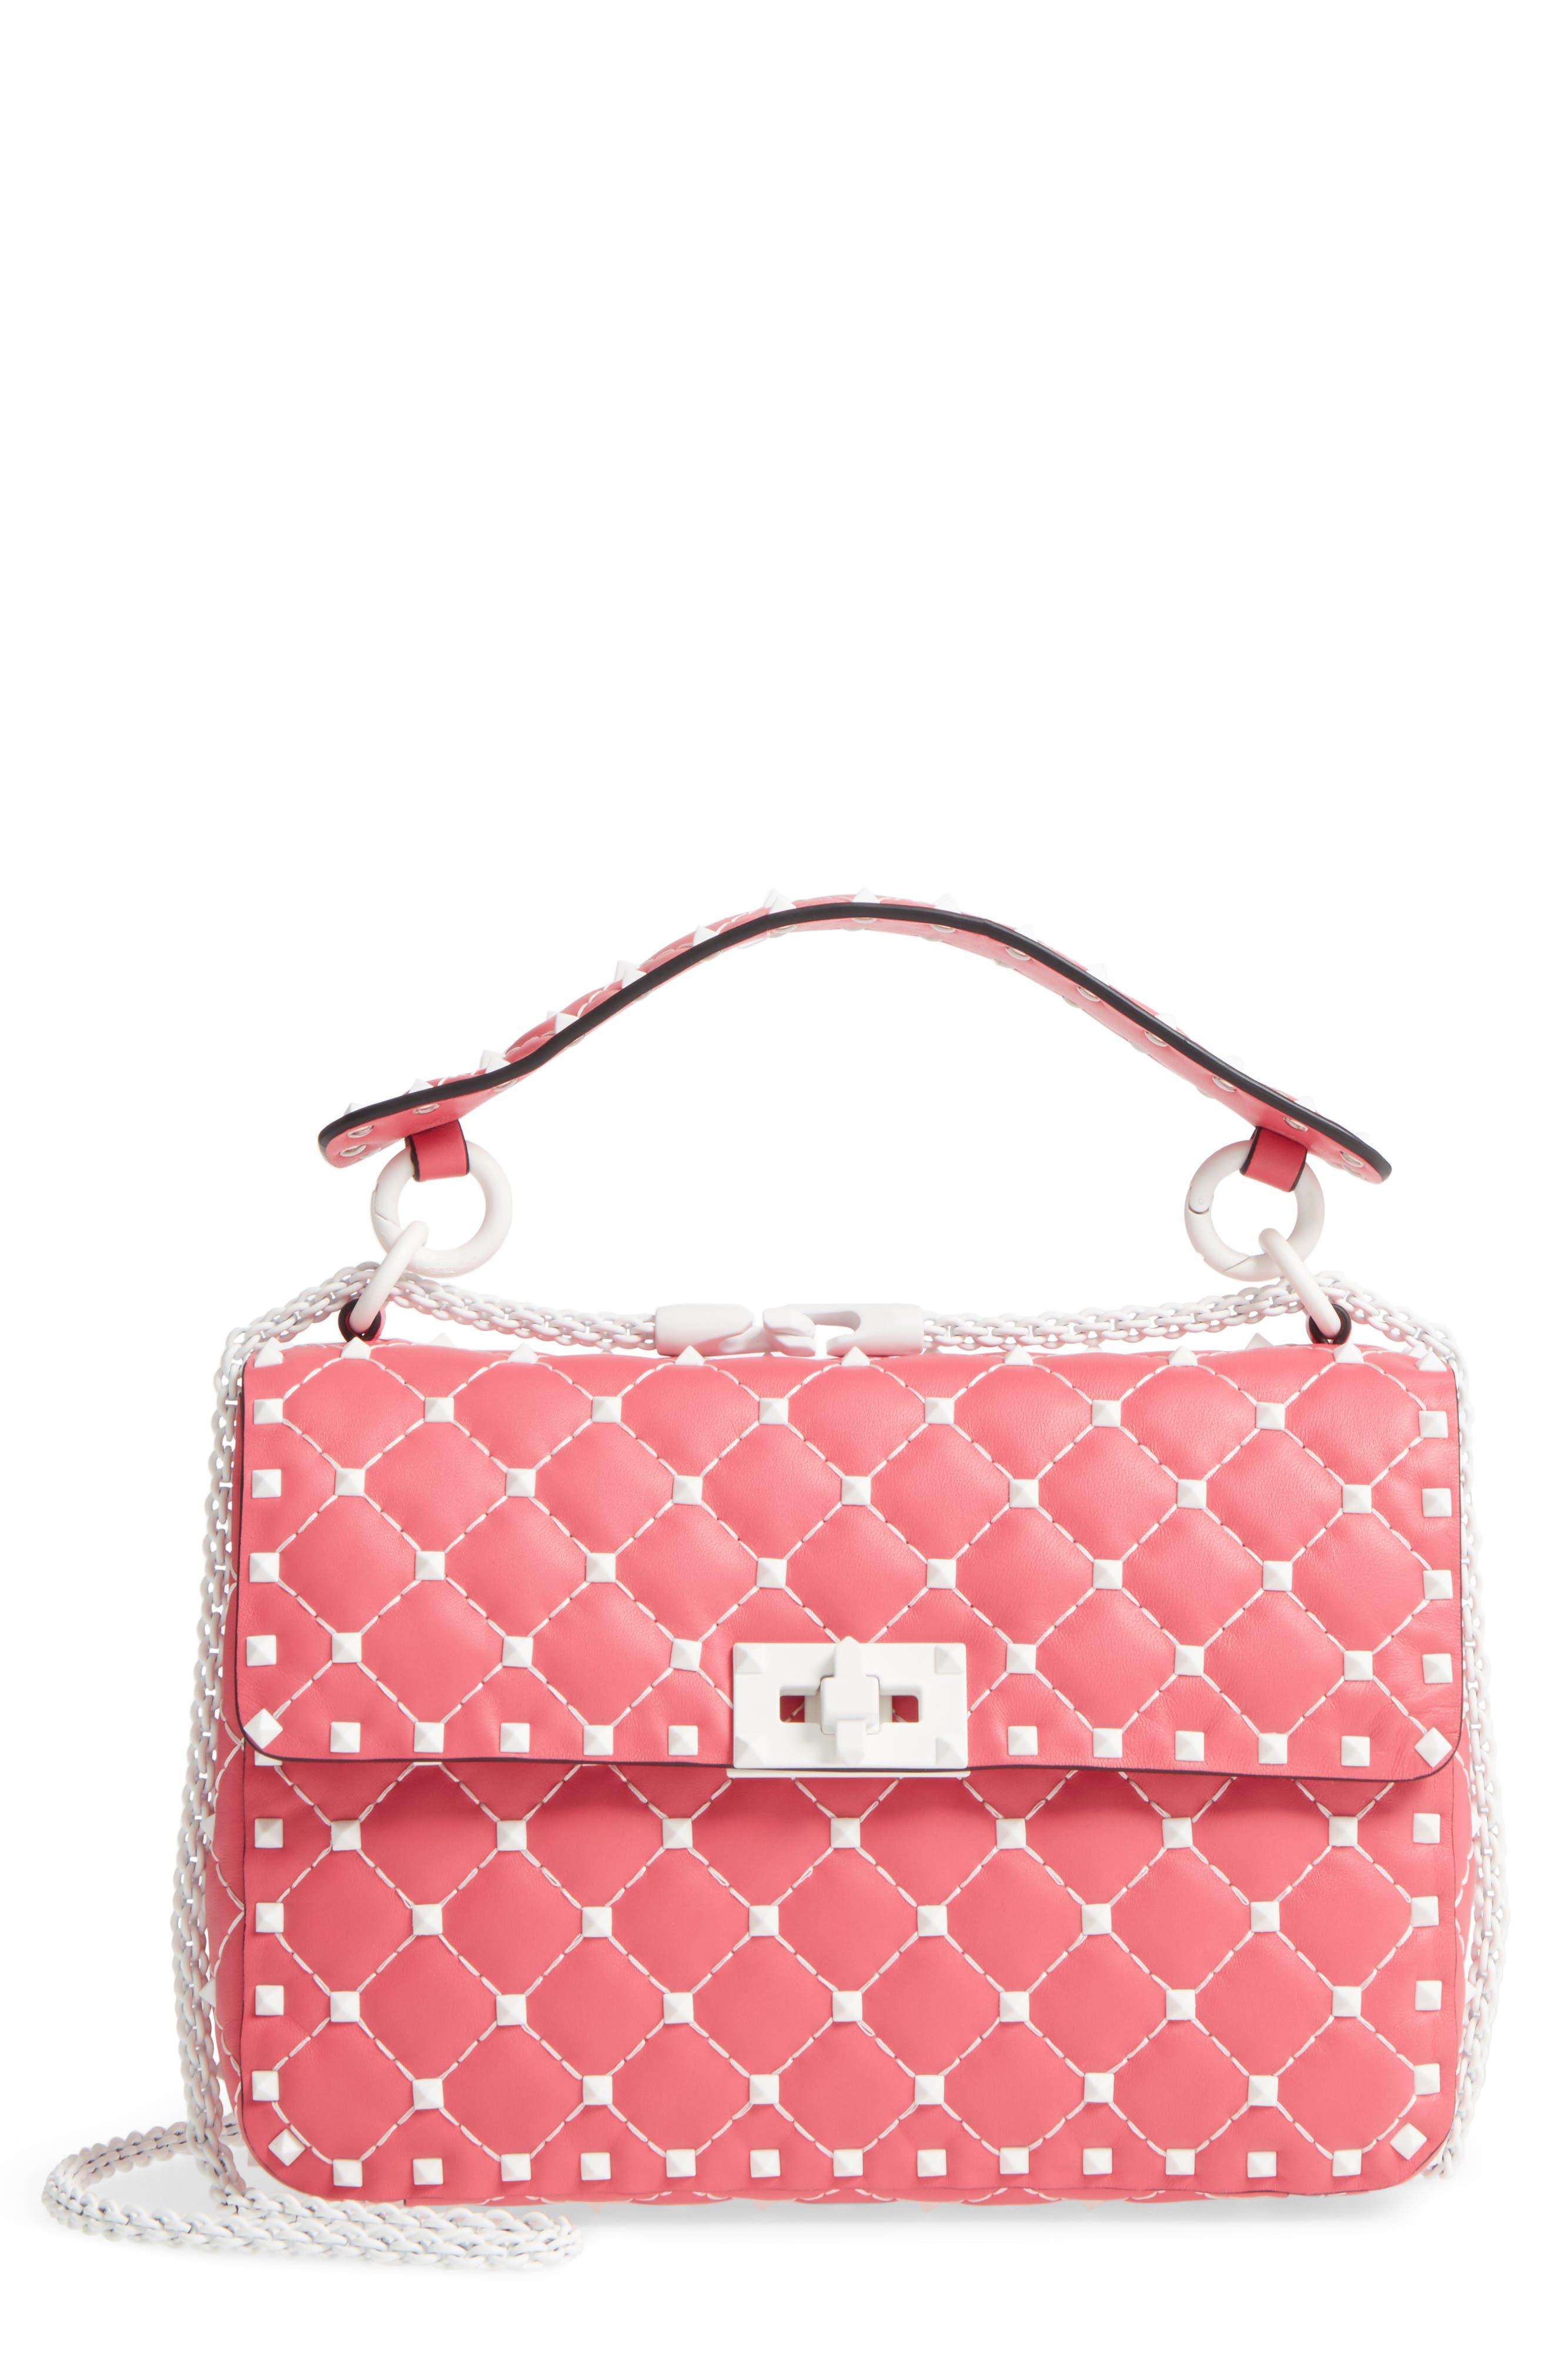 VALENTINO GARAVANI Medium Rockstud Matelassé Leather Shoulder Bag